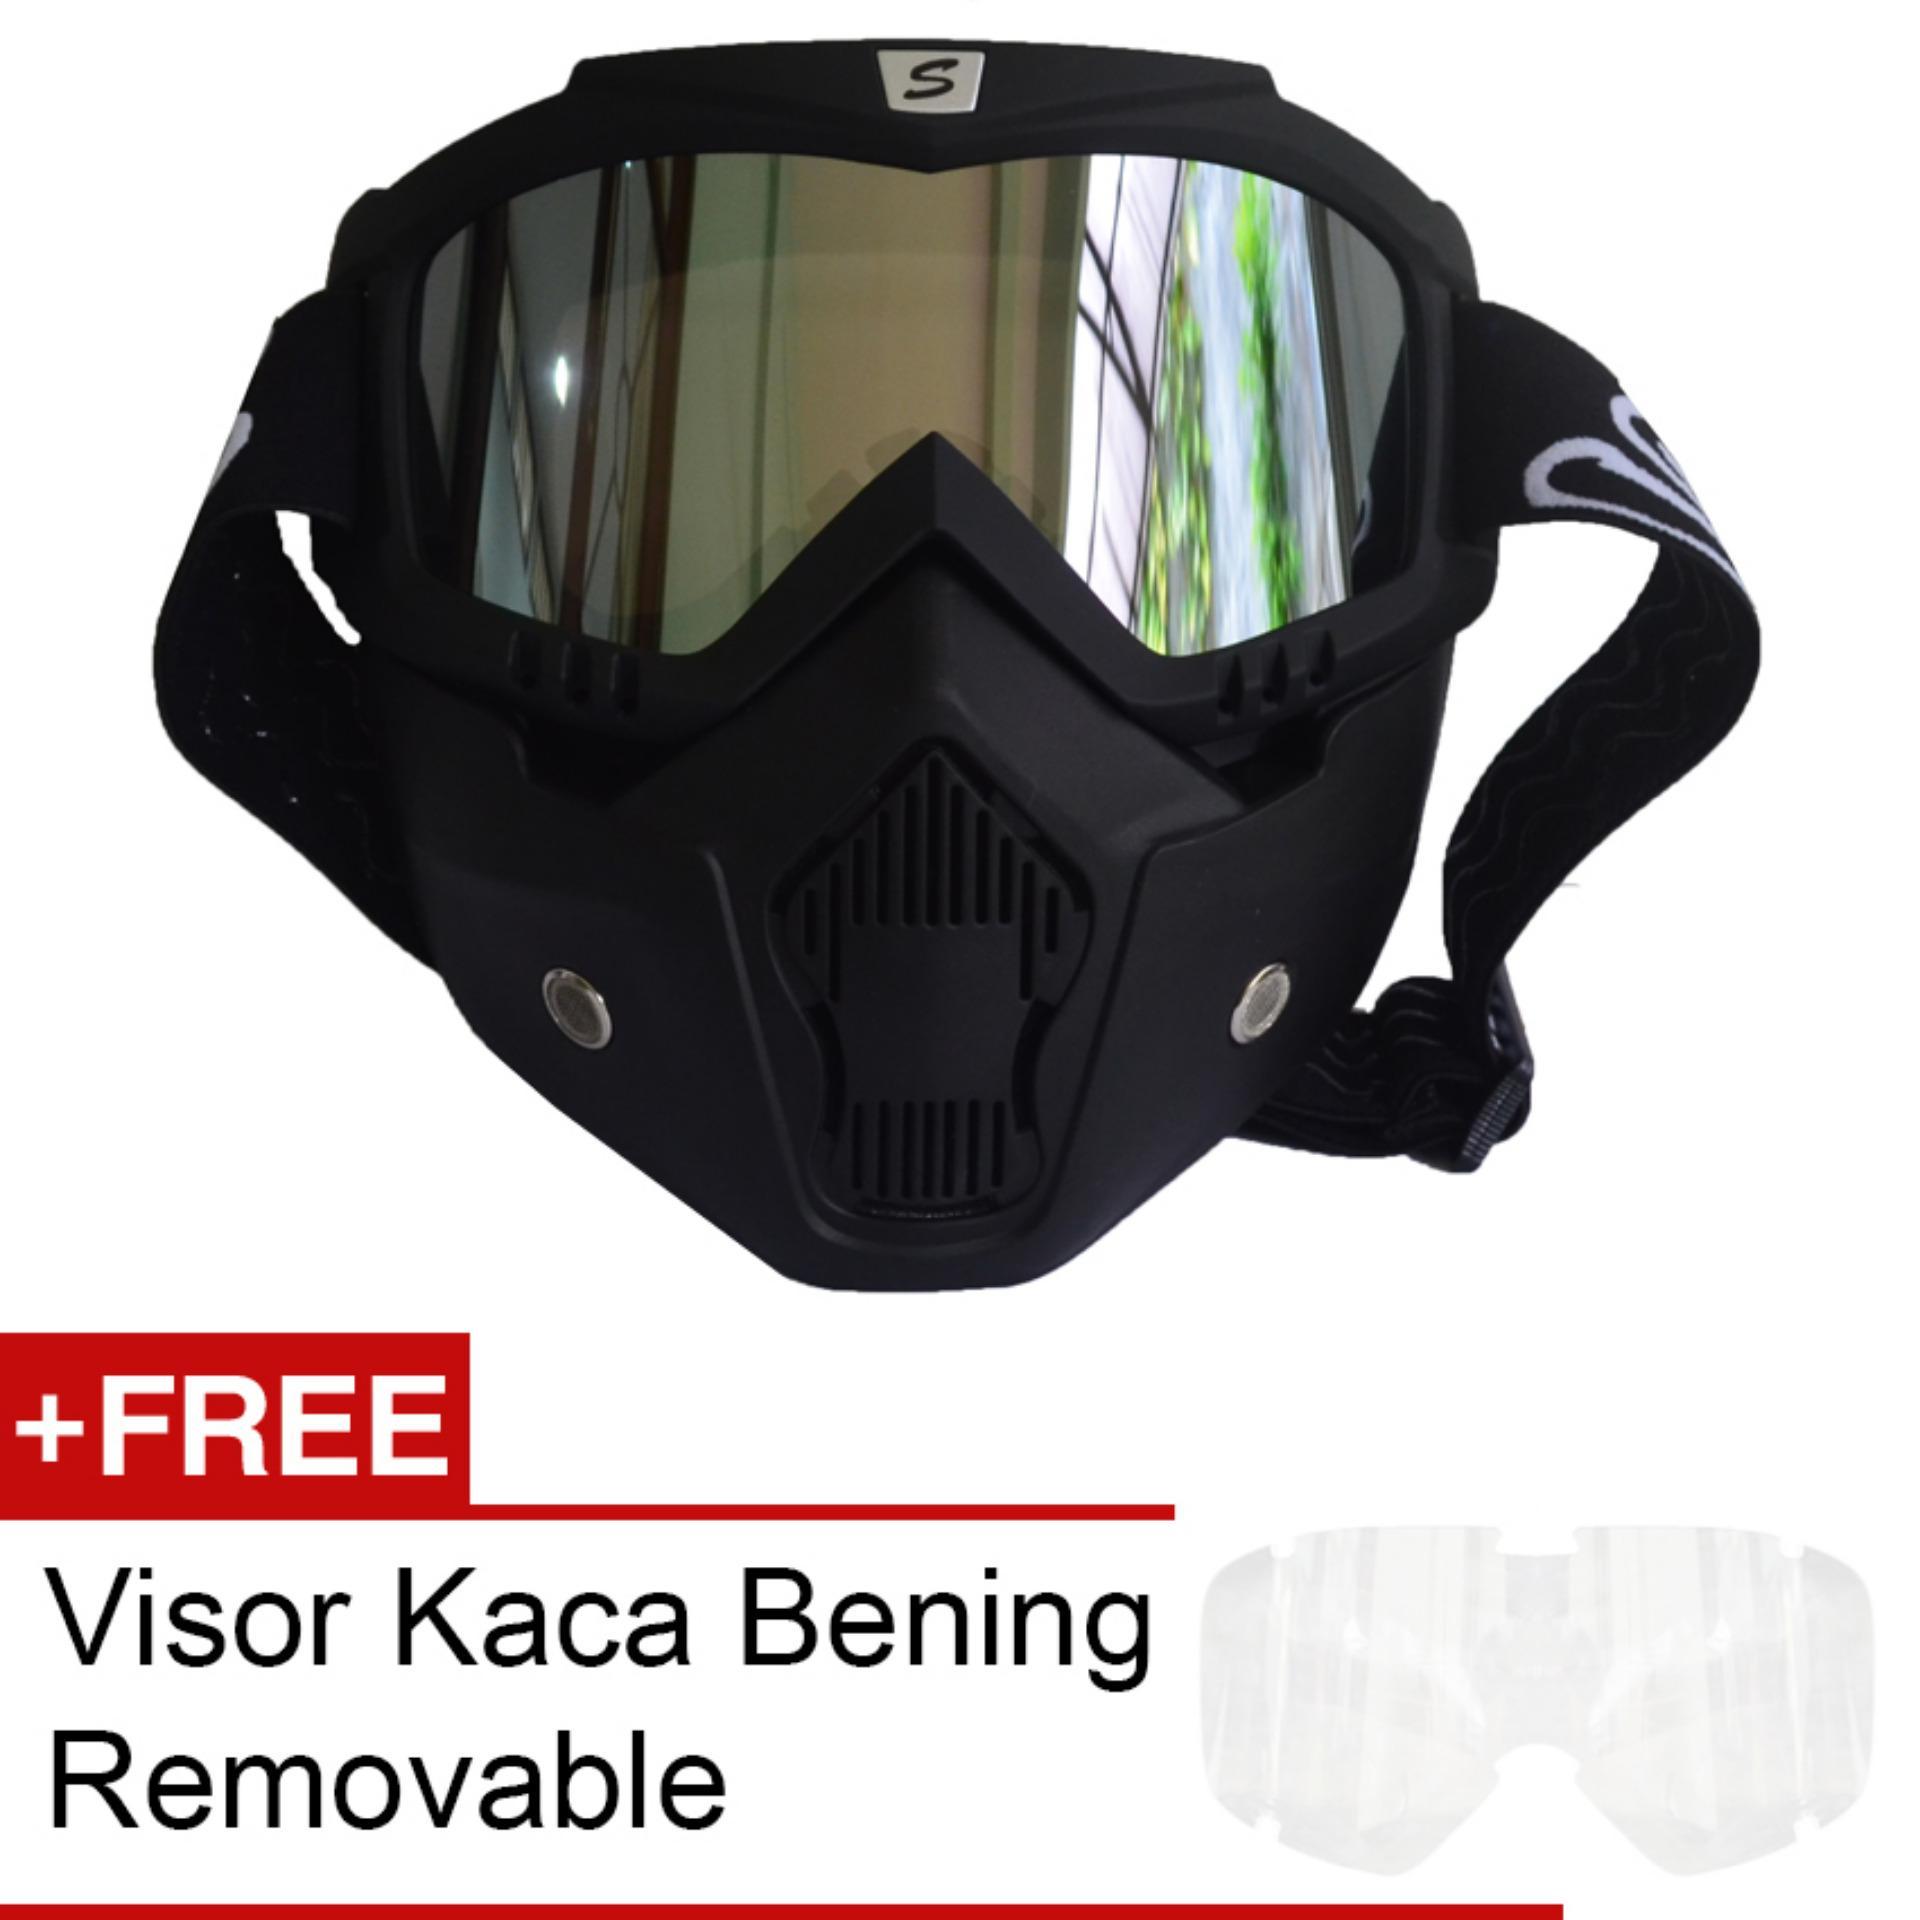 Snail Kaca Mata Goggle Motocross Full Masker Mx18 Pelangi Hitam Helm Face Mx309 Motif Skull Kilap